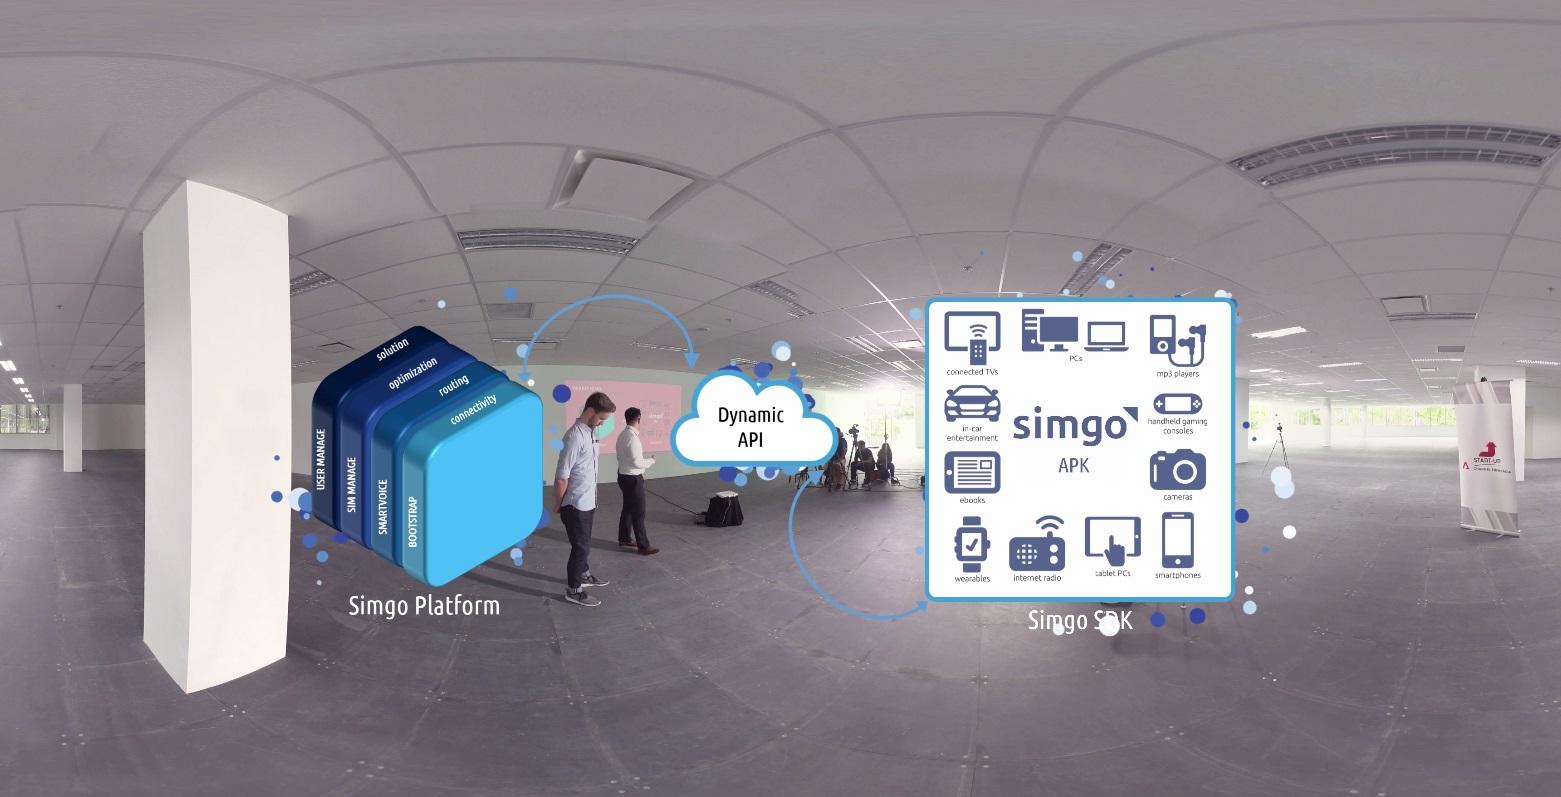 StartUp_360_VR_presentation_1.jpg